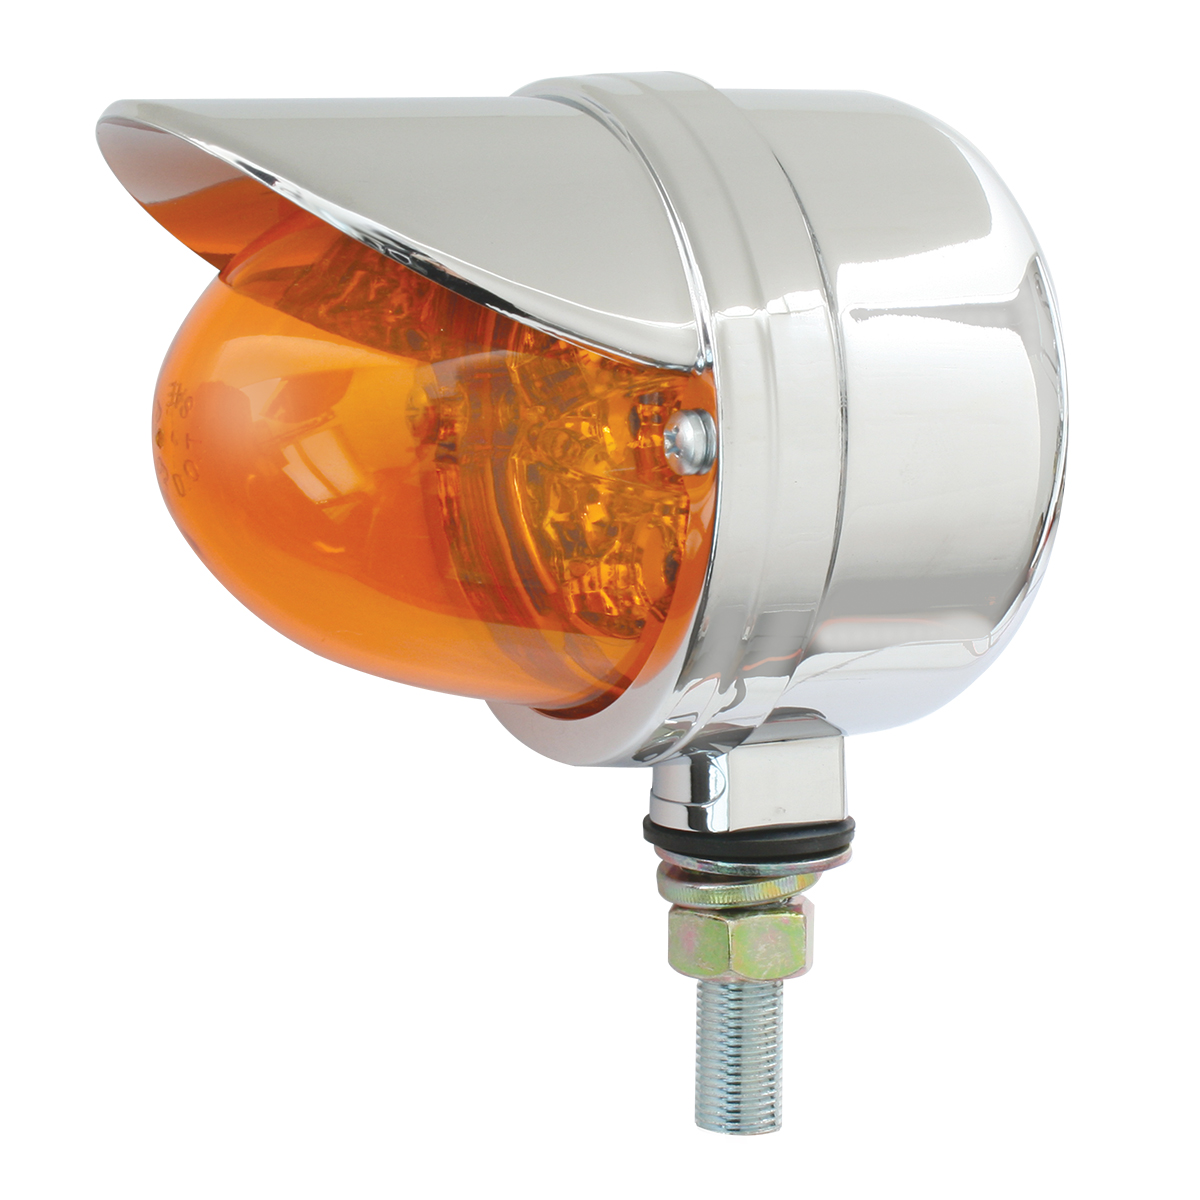 77922 Single Face Spyder LED Pedestal Light in Amber/Amber